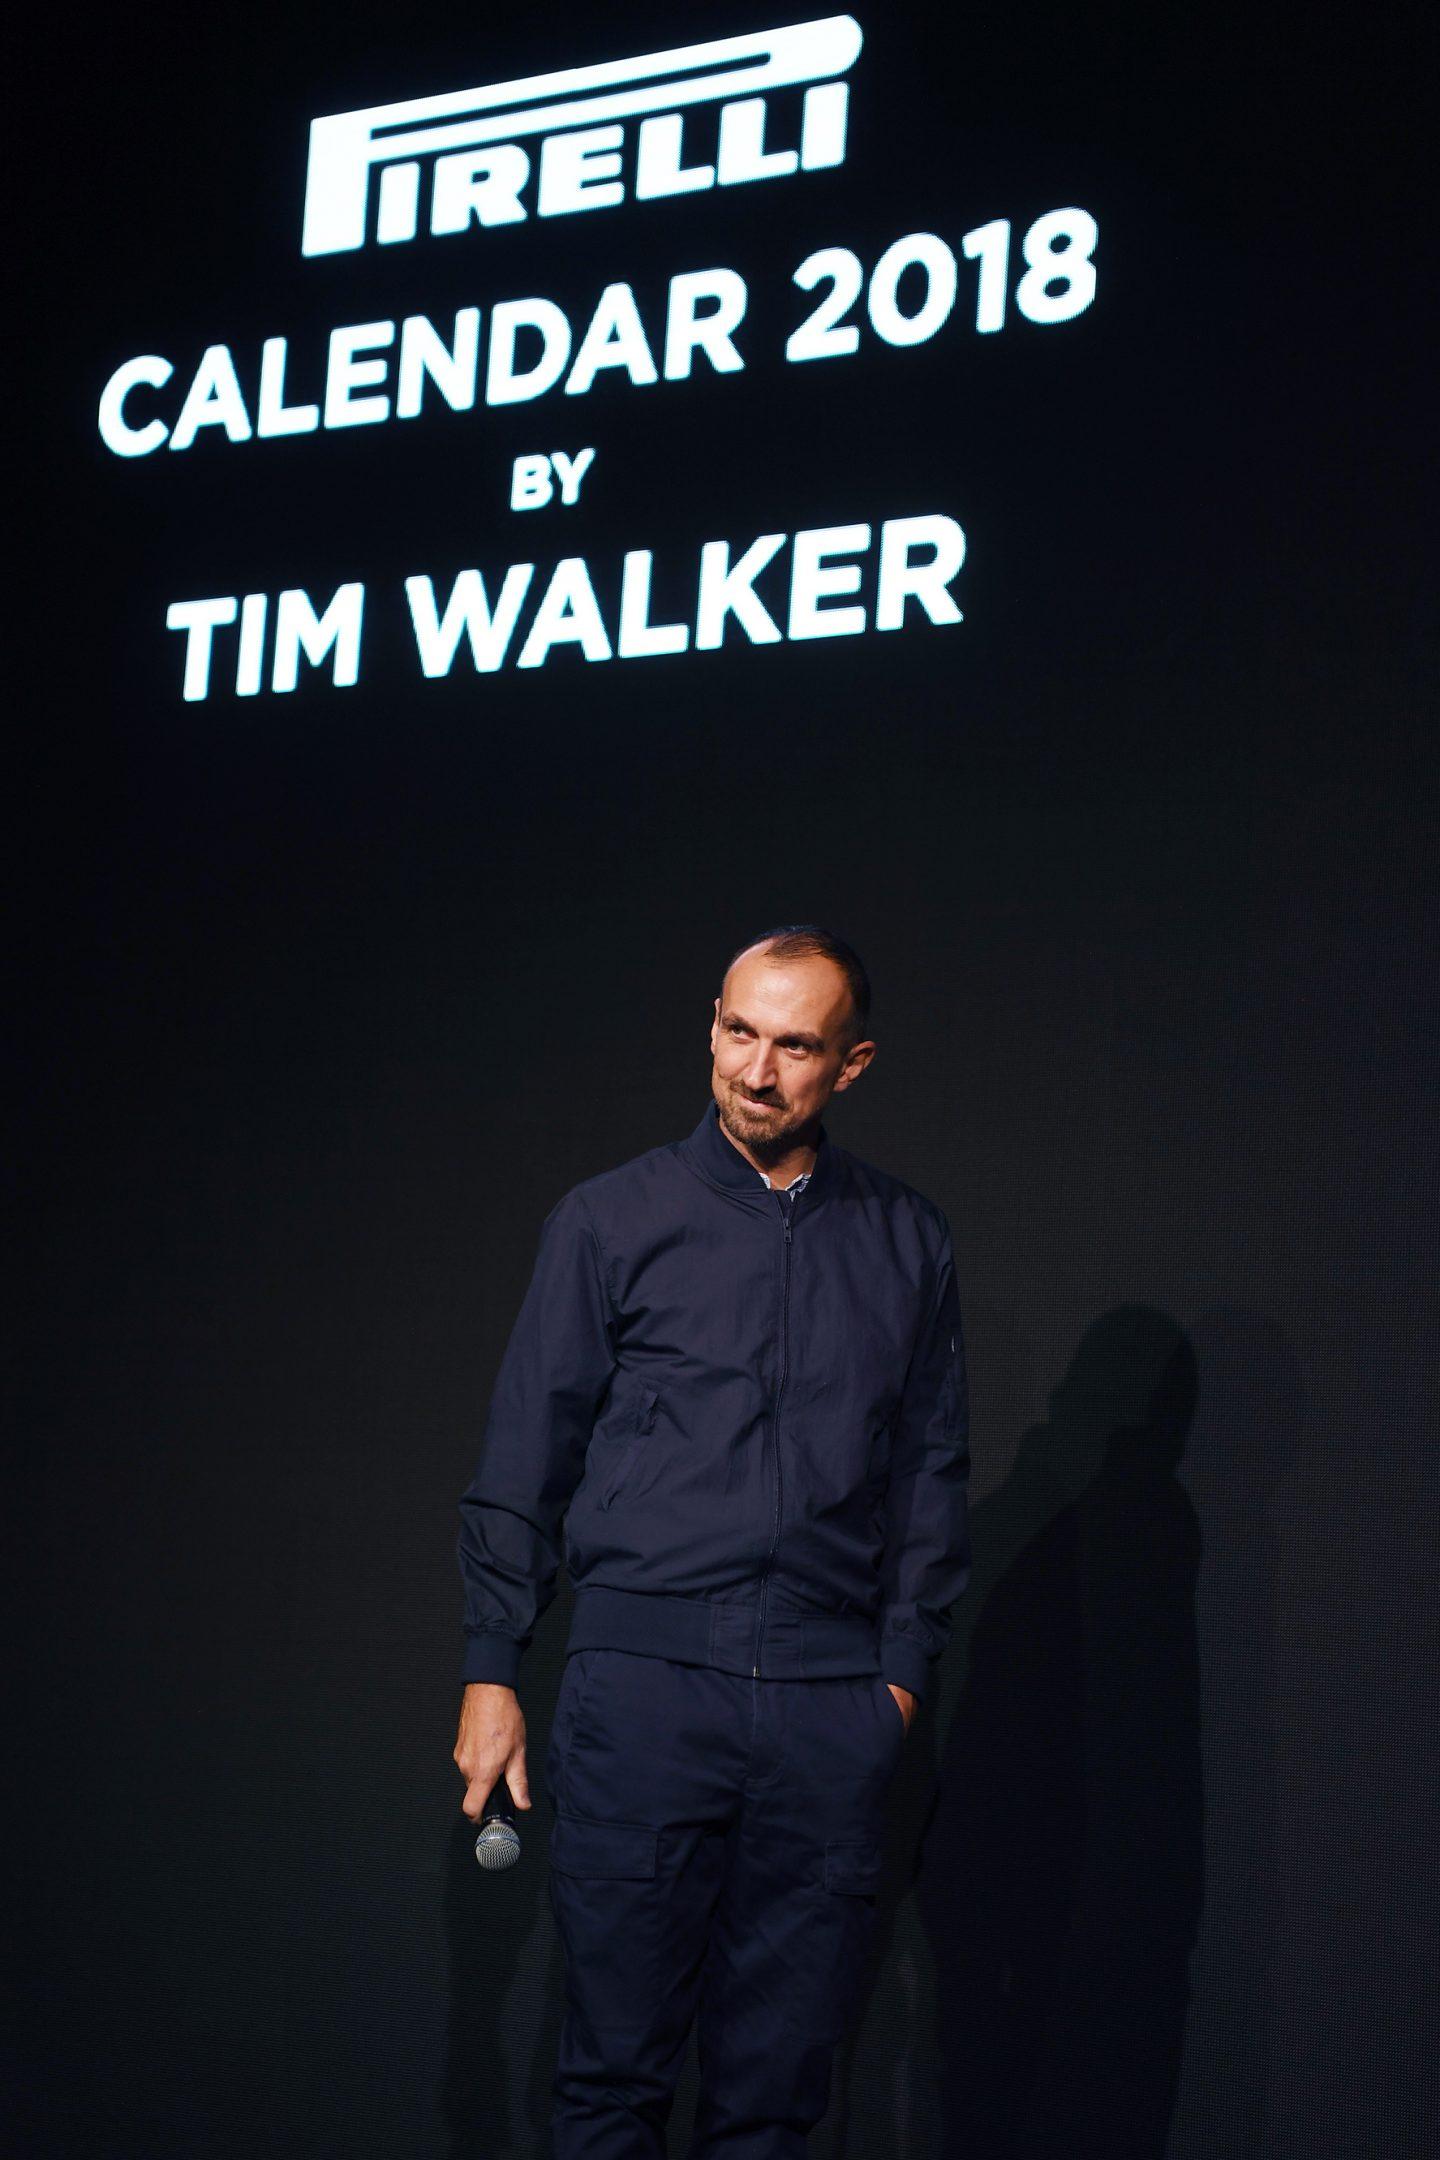 Tim Walker © Pirelli Kalender 2018, Tim Walker